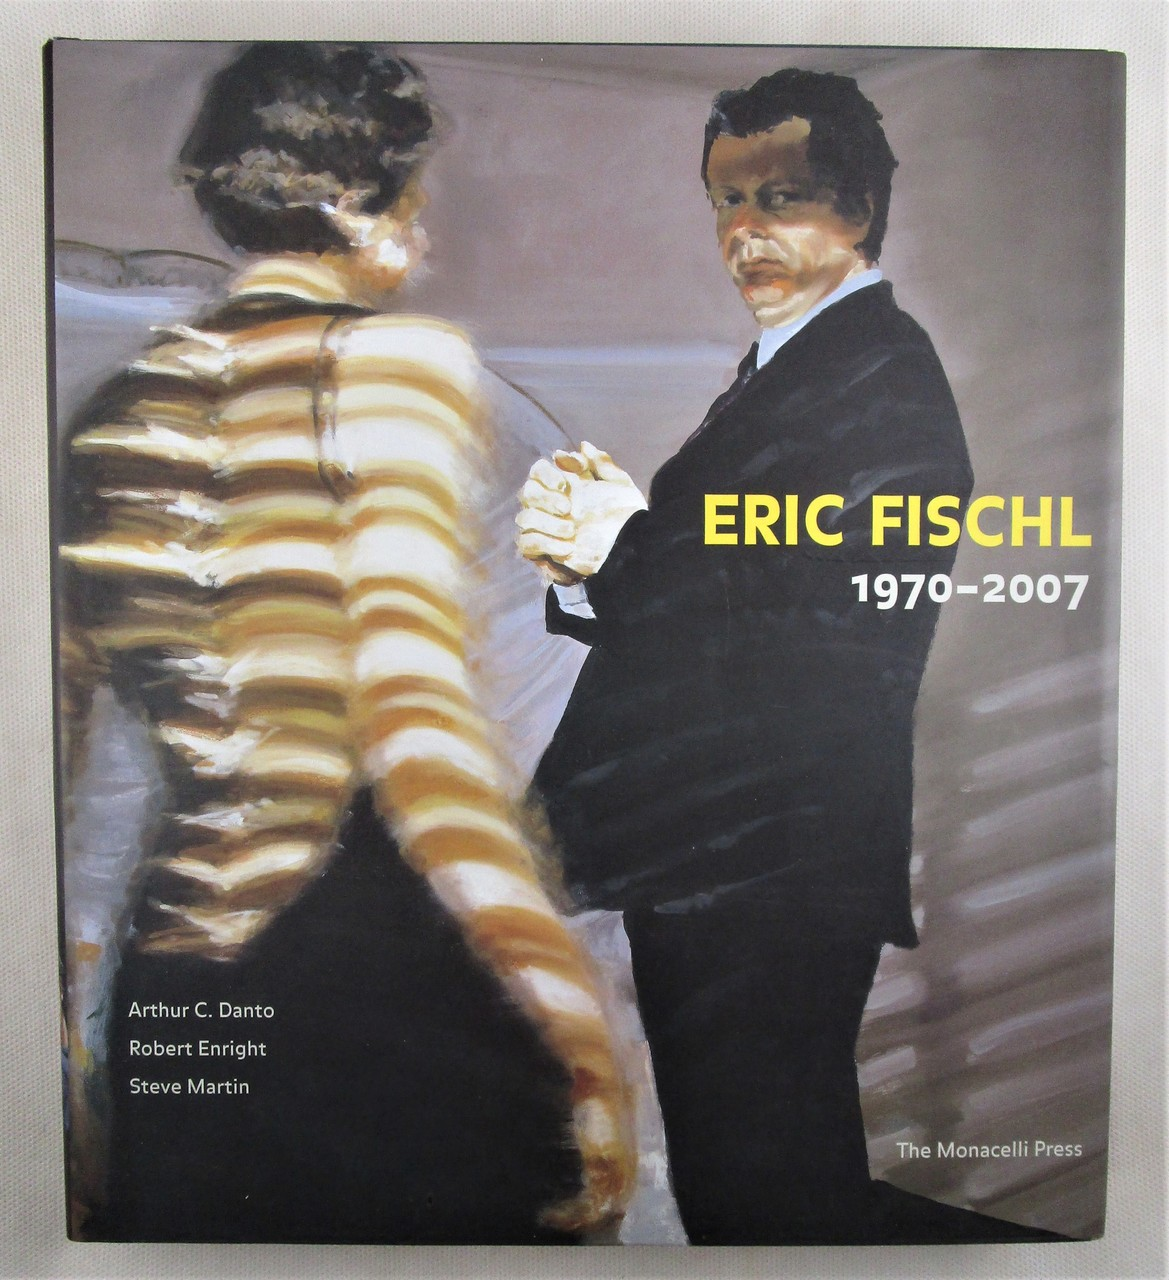 ERIC FISCHL 1970-2007, by Arthur C. Danto, Robert Enright, Steve Martin - 2008